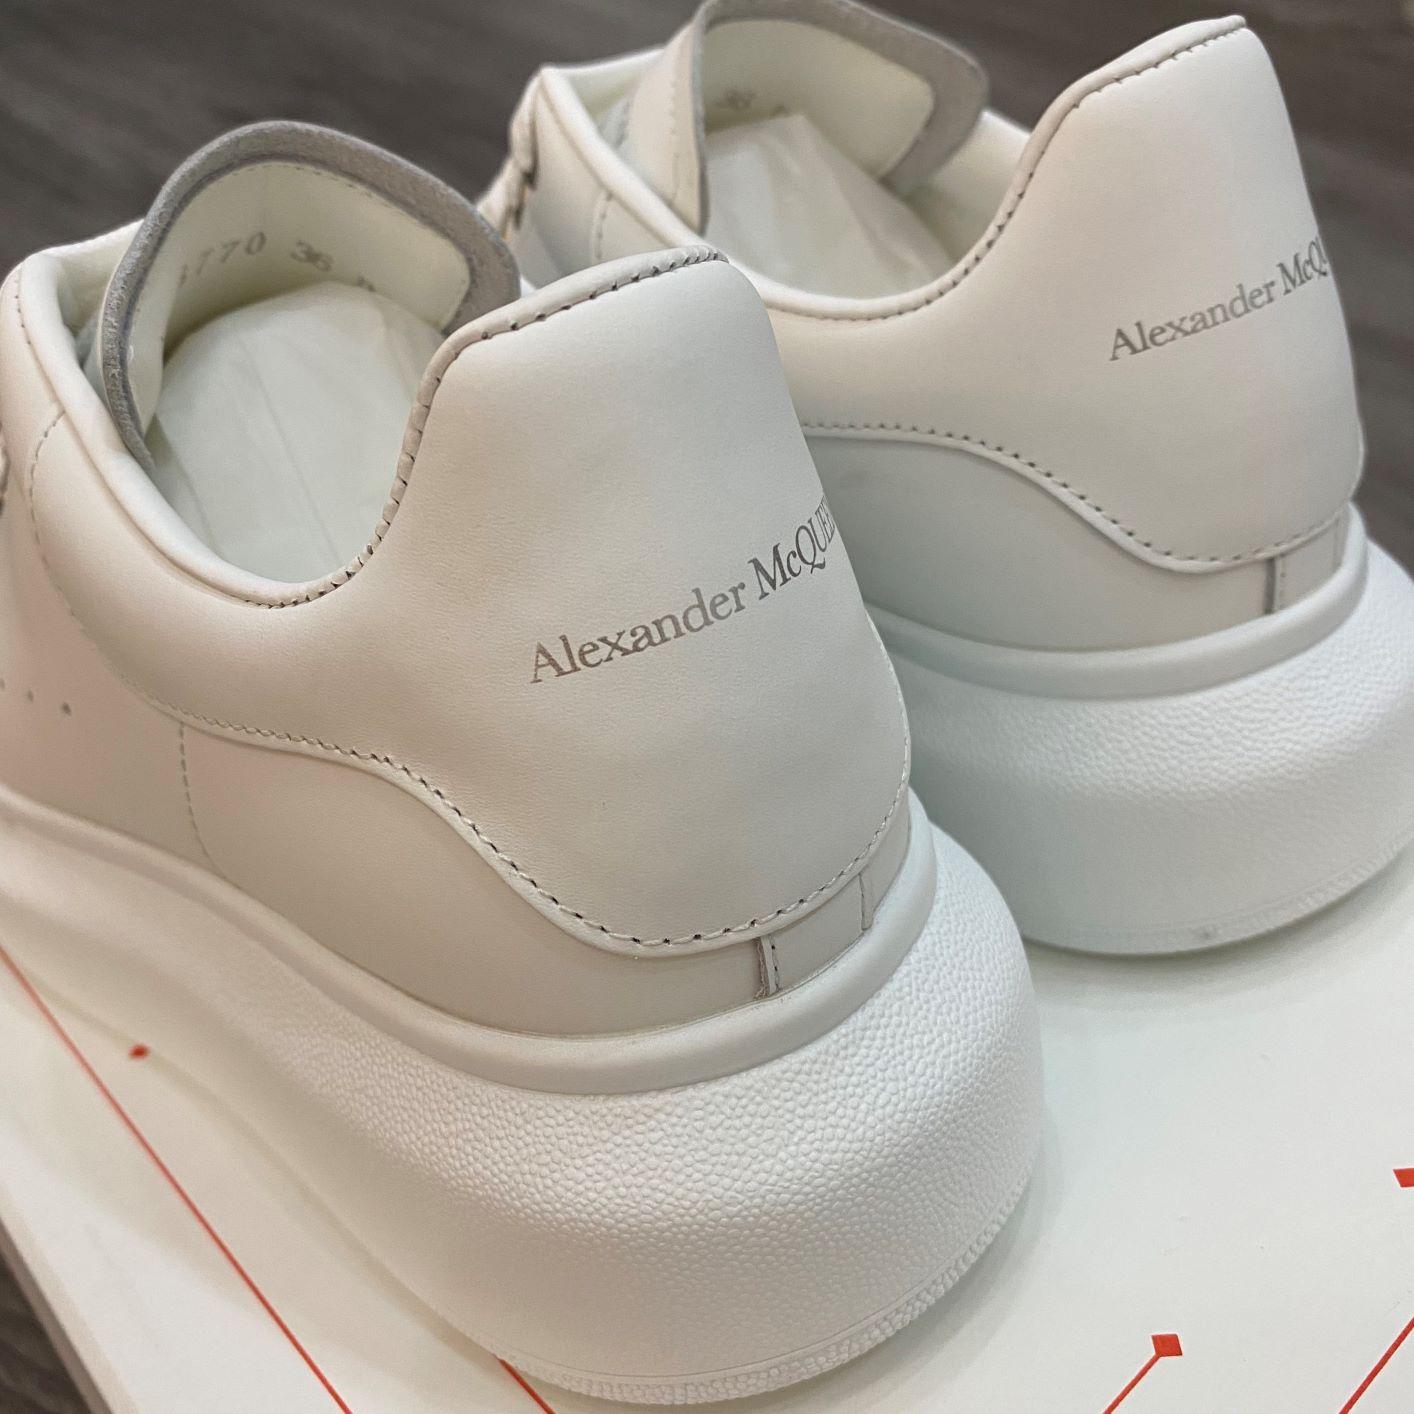 Giày Alexander McQueen mũi kim loại